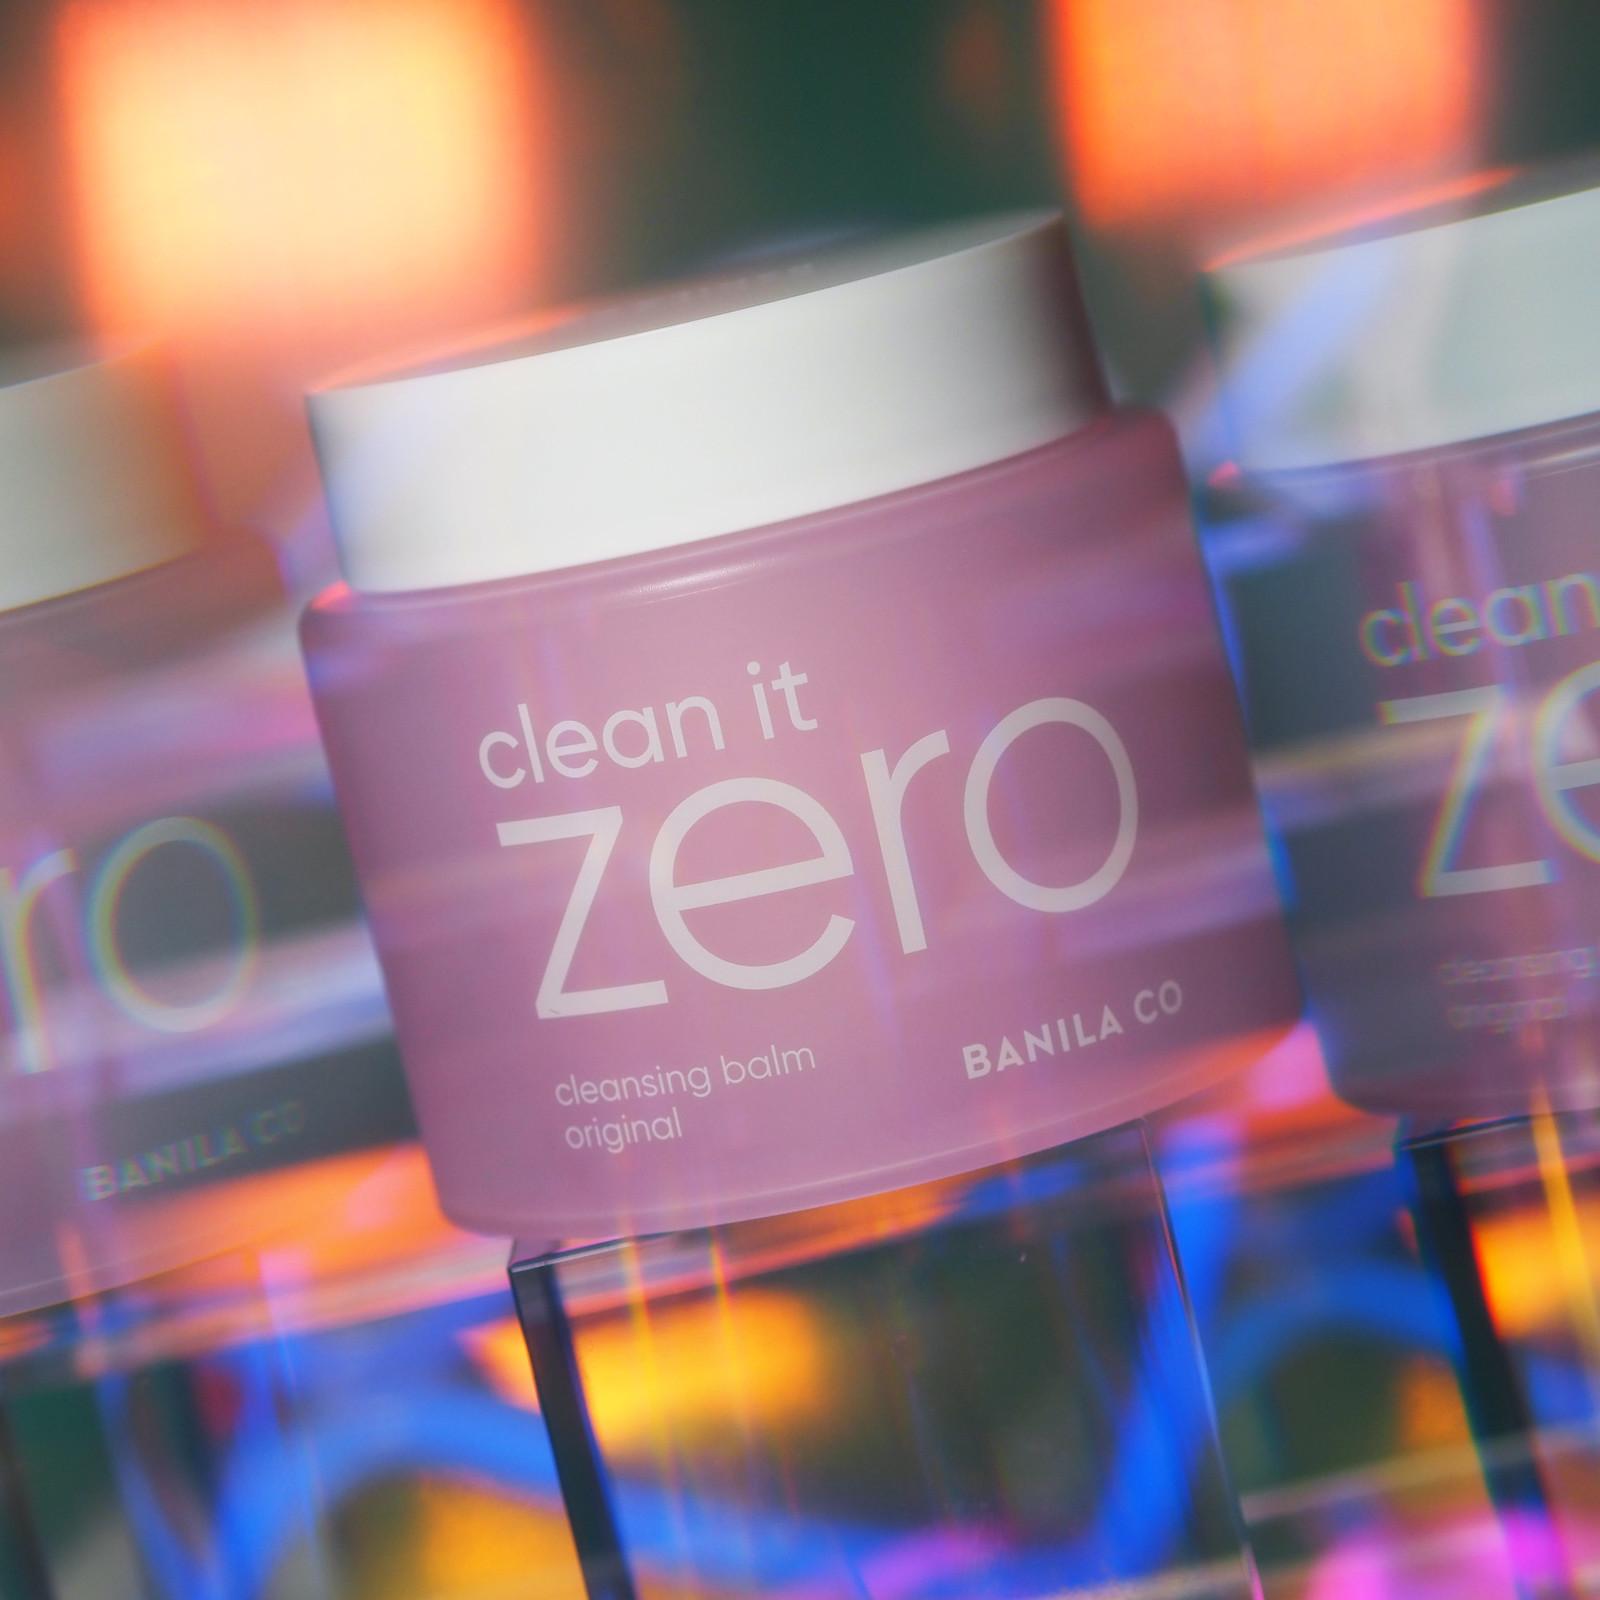 Popular Korean Kbeauty Banila Co Clean It Zero Cleansing Balm Review